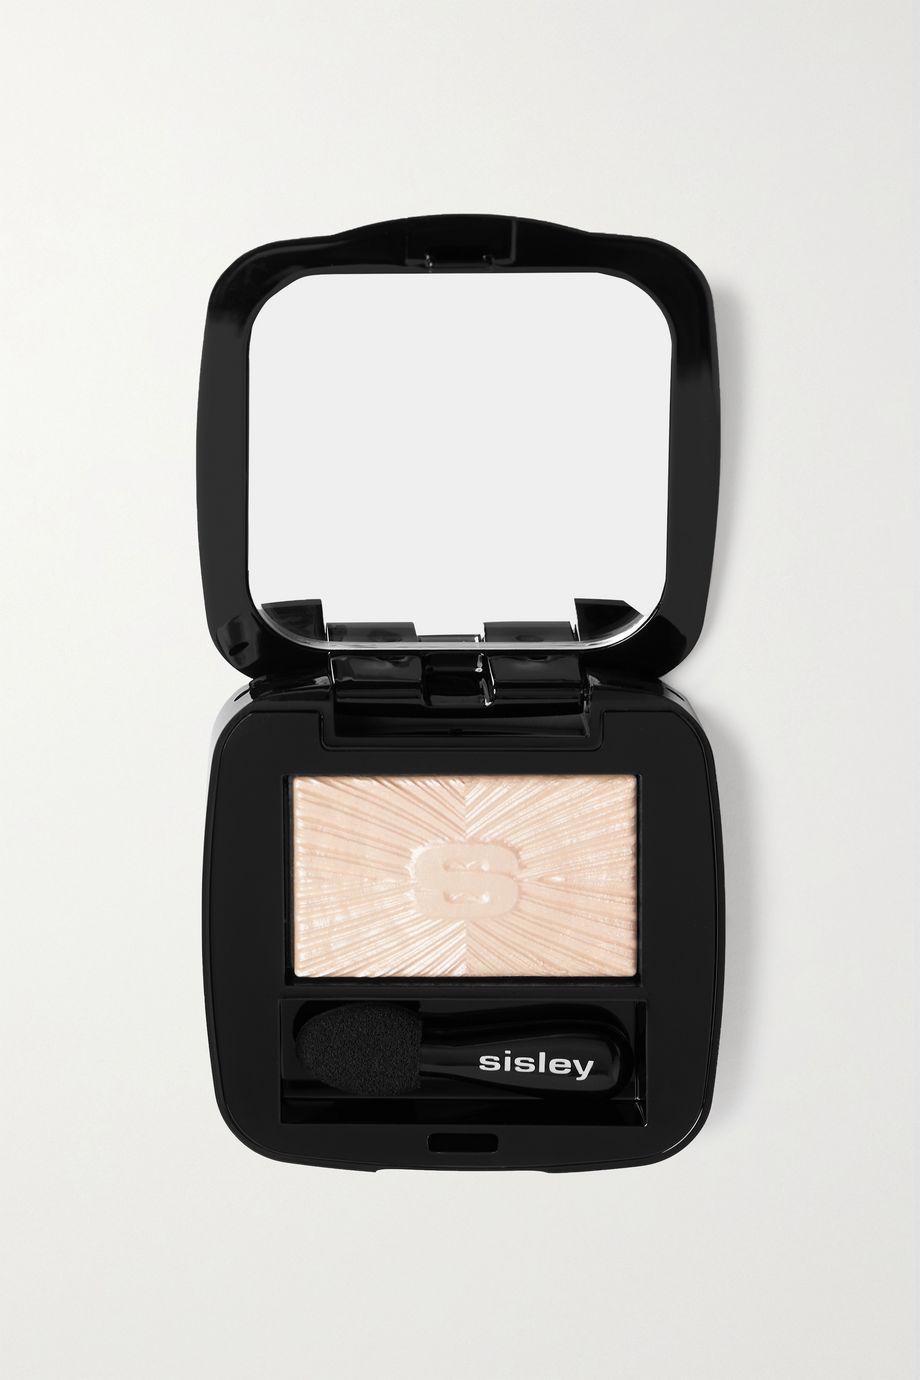 Sisley Les Phyto-Ombres Eyeshadow - 10 Silky Cream